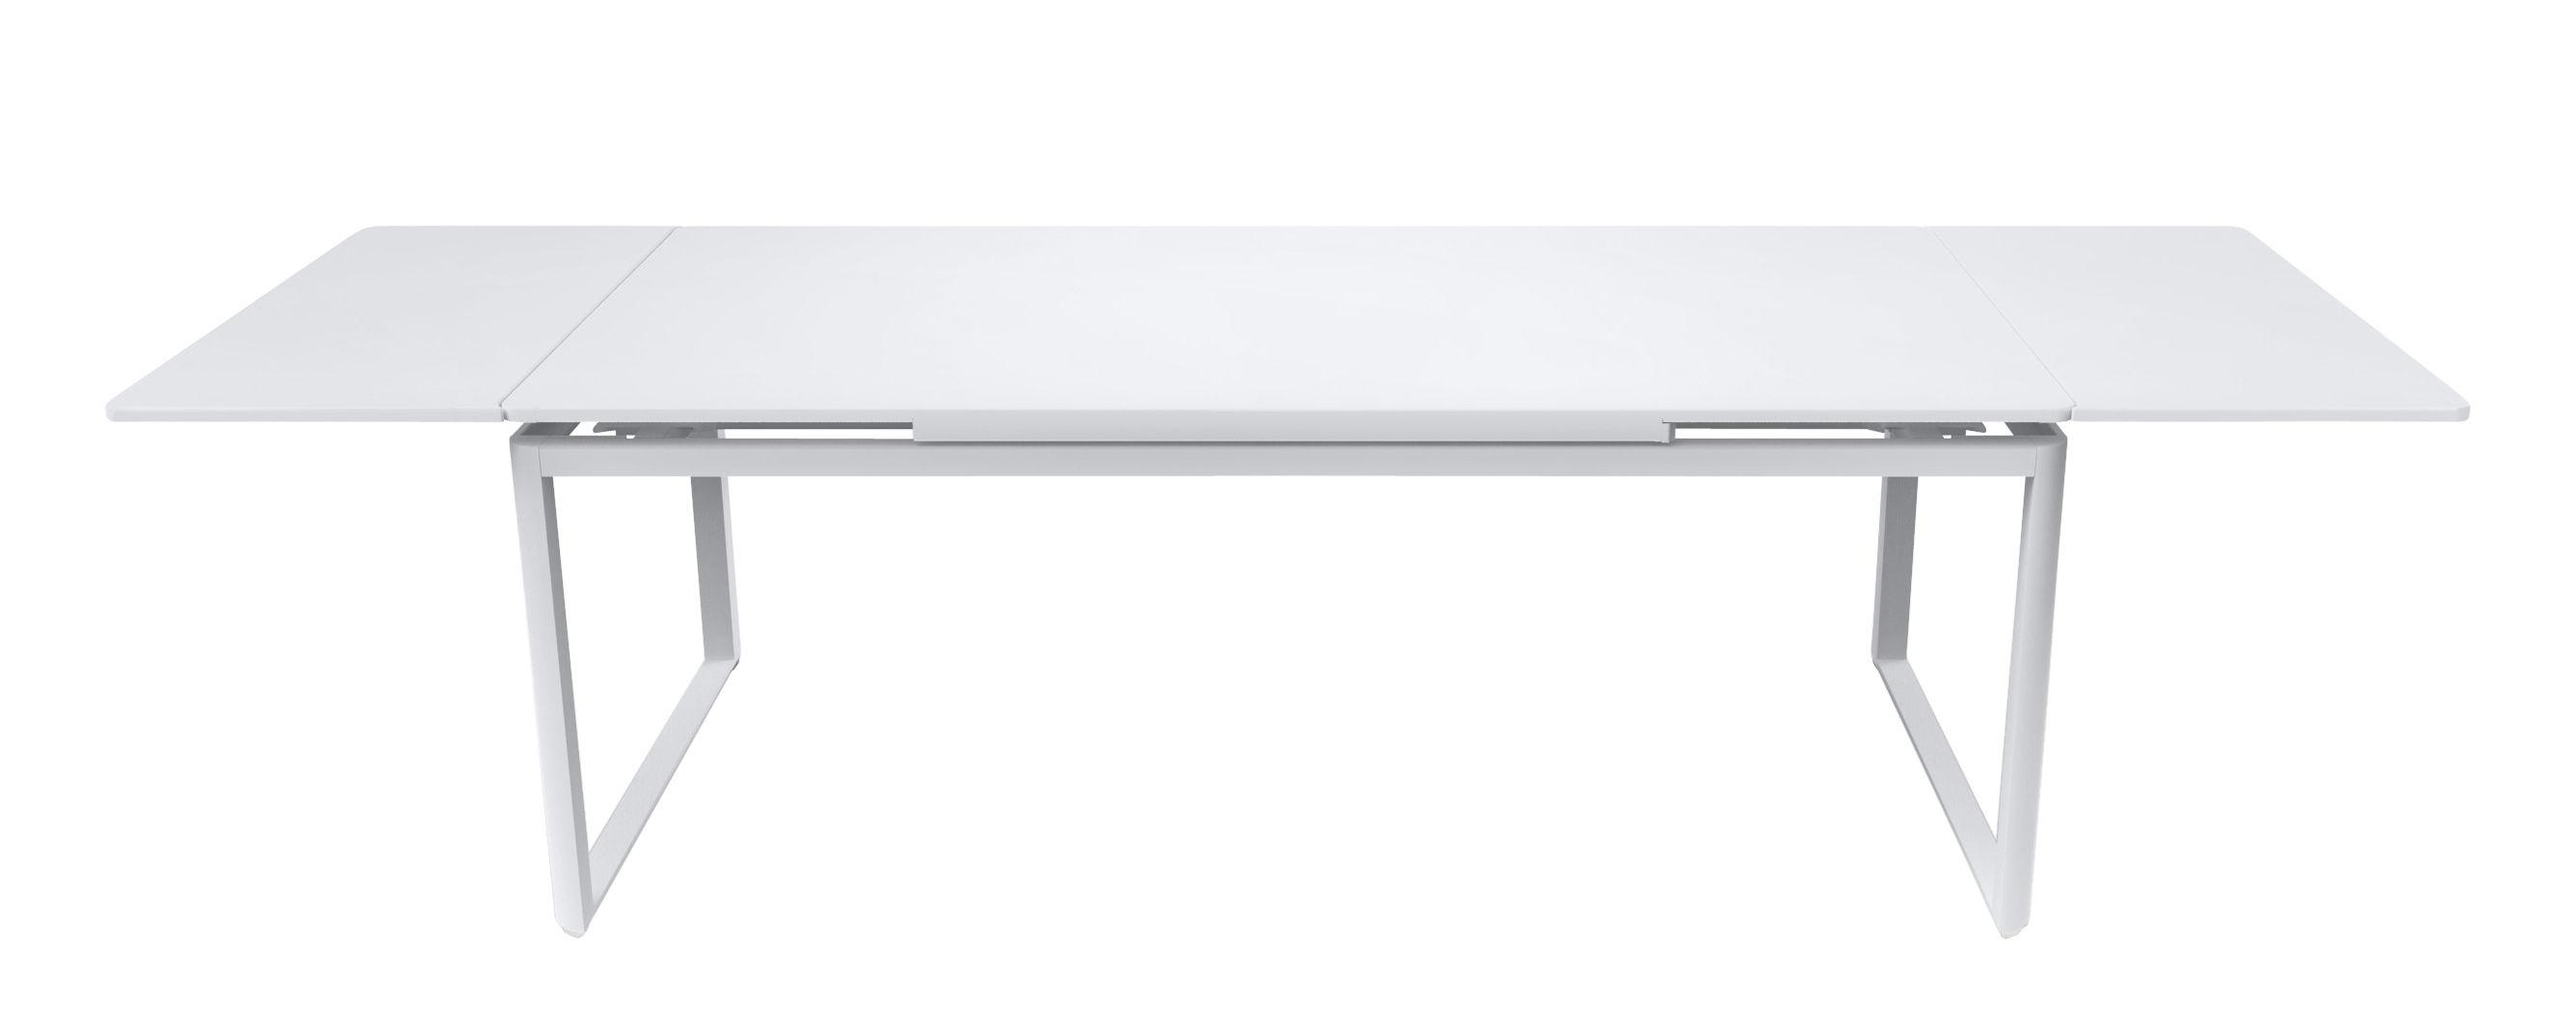 Outdoor - Tables de jardin - Table à rallonge Biarritz / L 200 à 300 cm - Fermob - Blanc - Acier laqué, Aluminium laqué